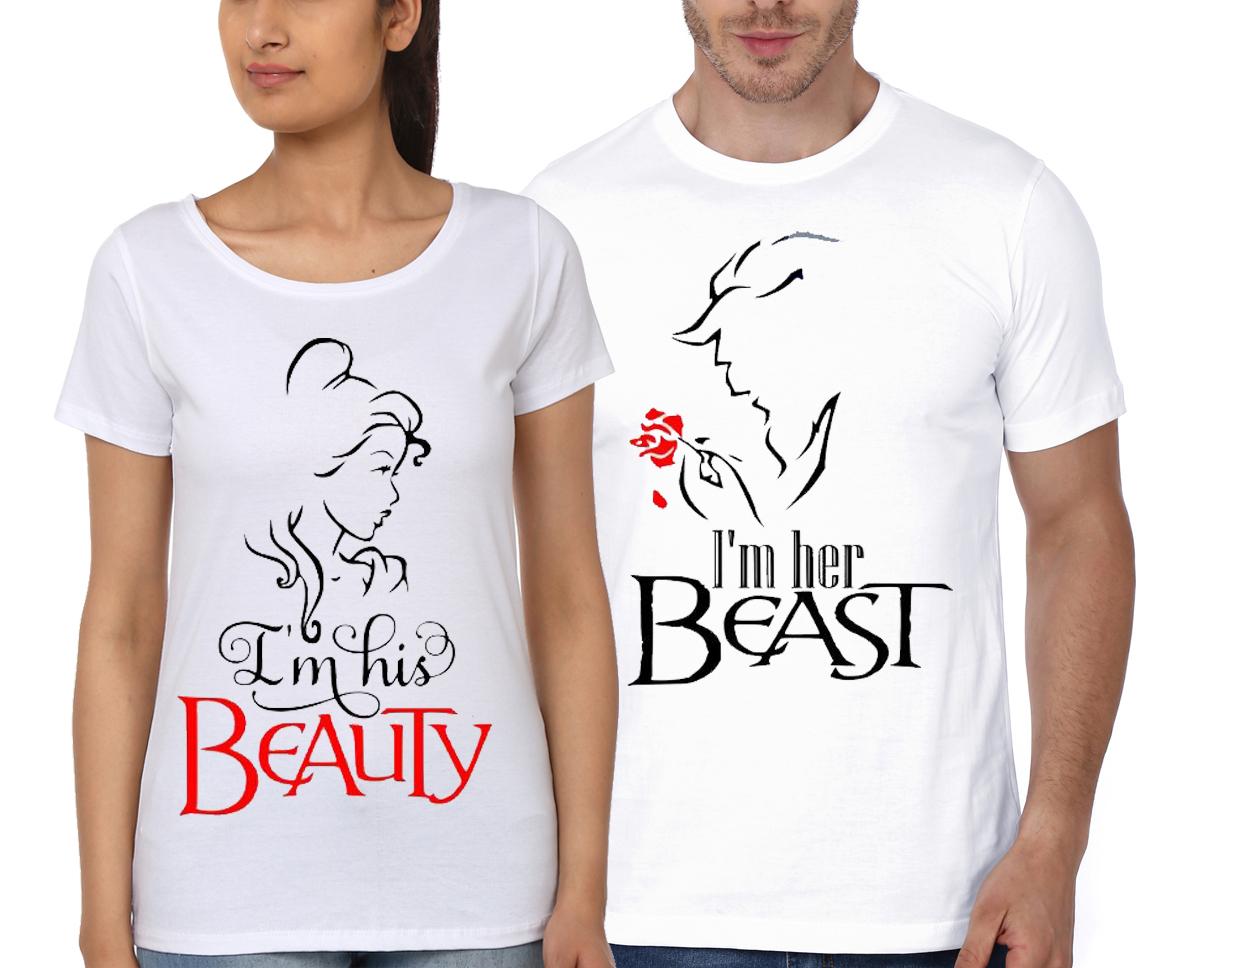 ac5880f994 I'm His Beauty / I'm Her Beast White Couple T-Shirt | Swag Shirts